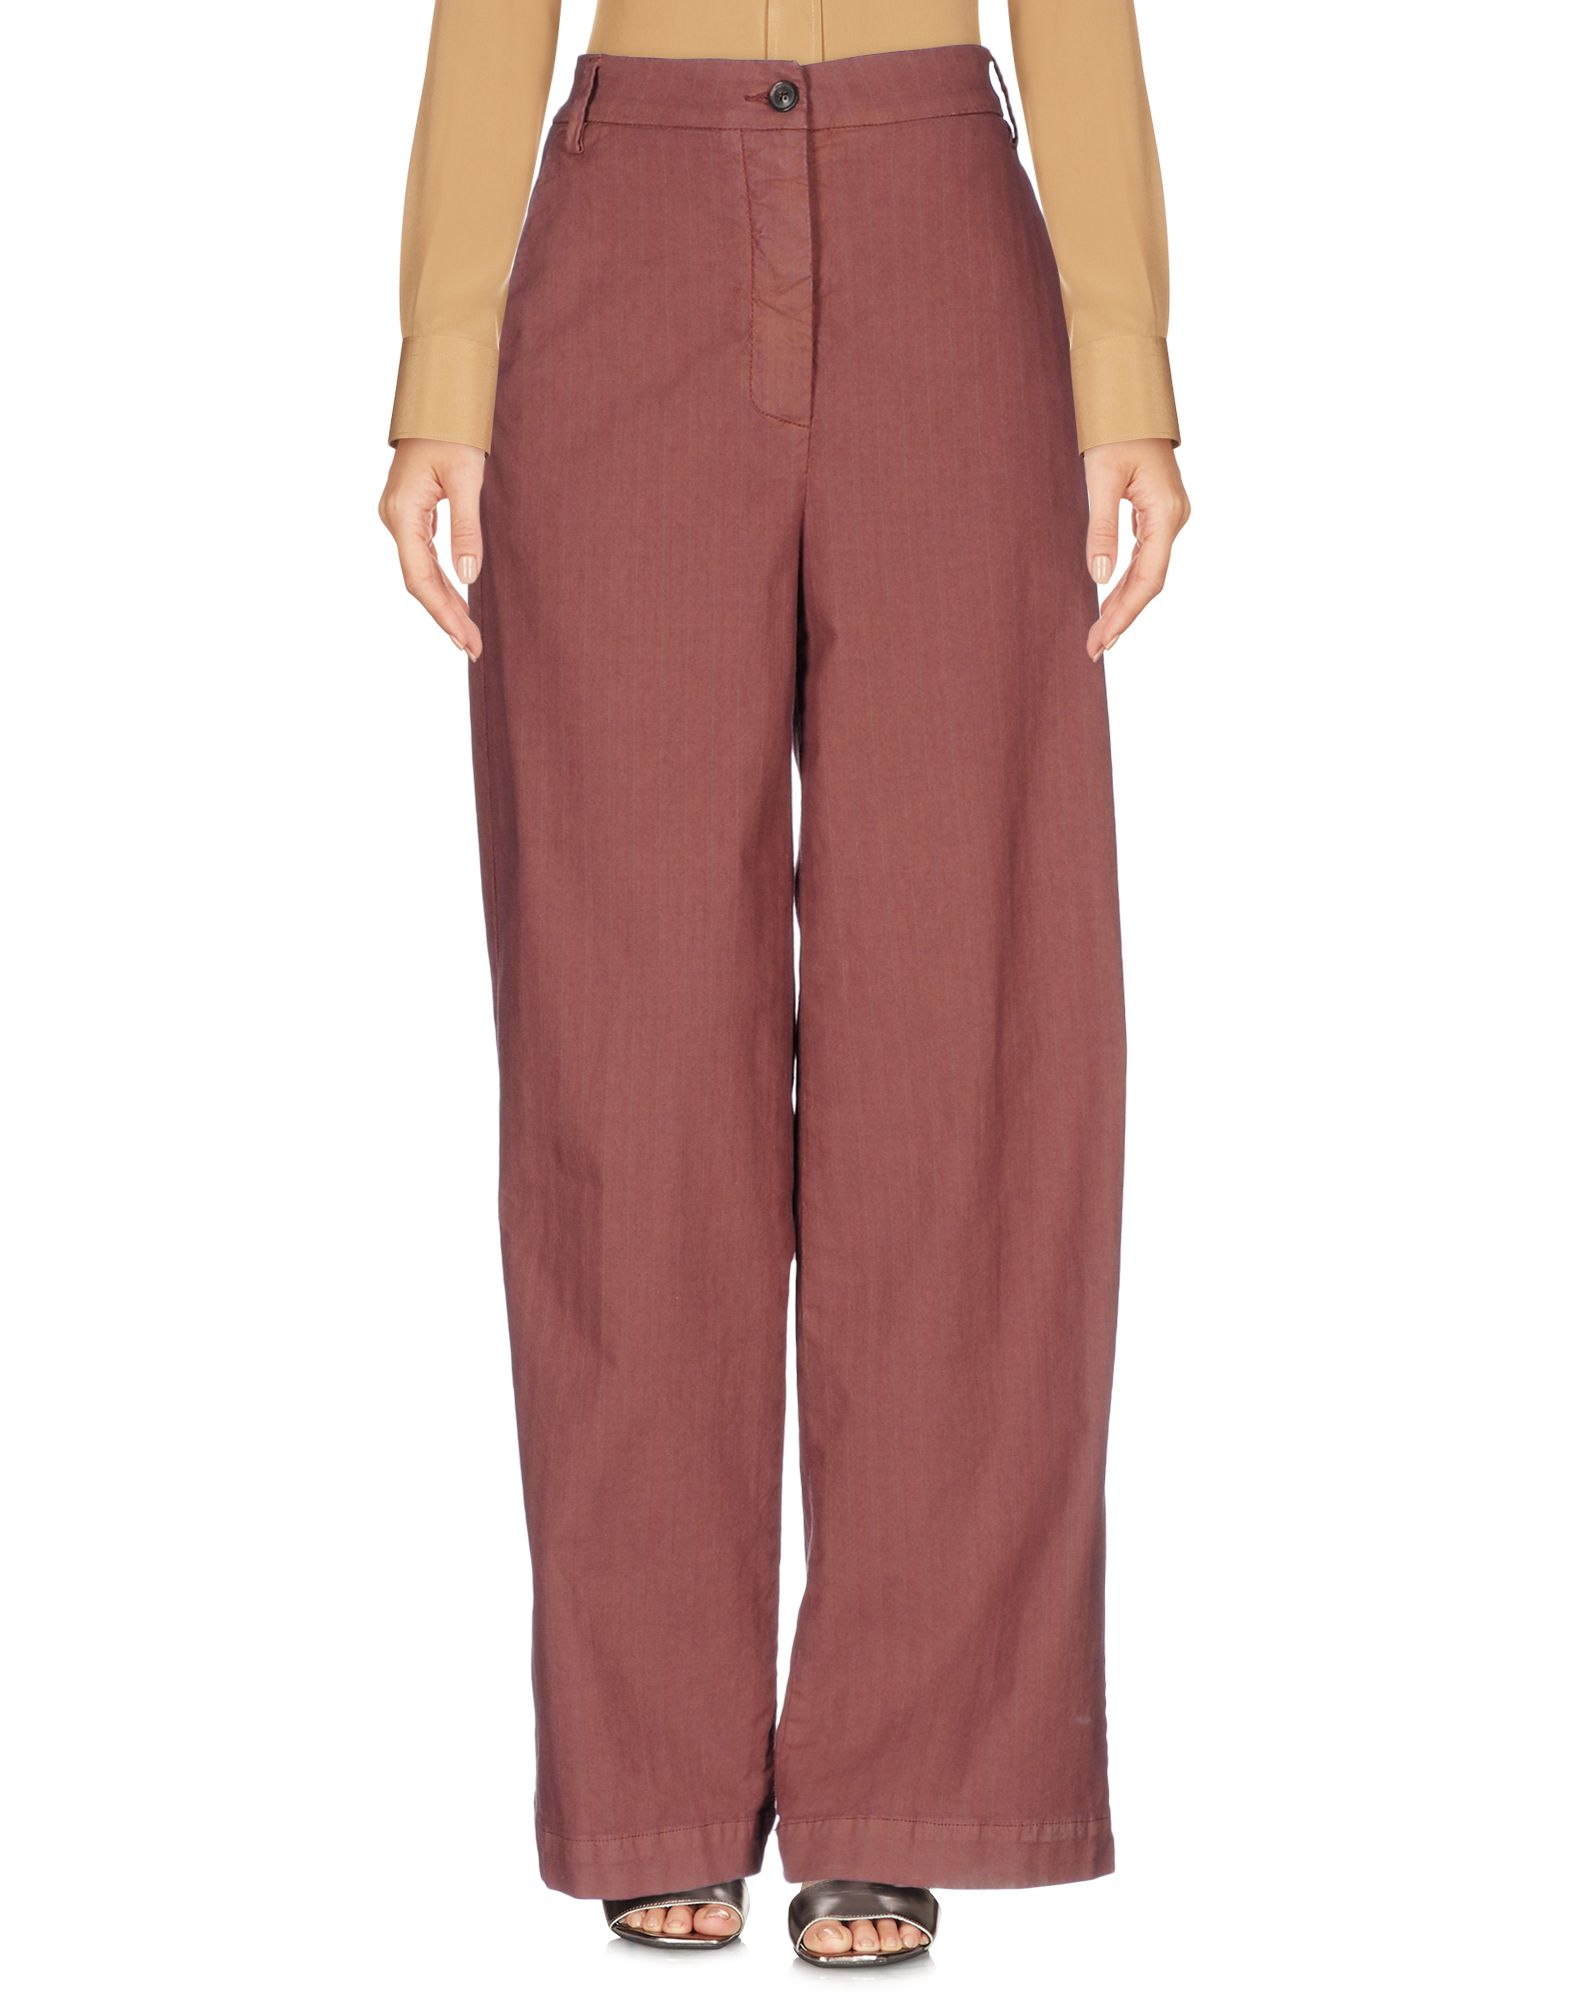 Pantalone True Nyc. damen - 13137600Q